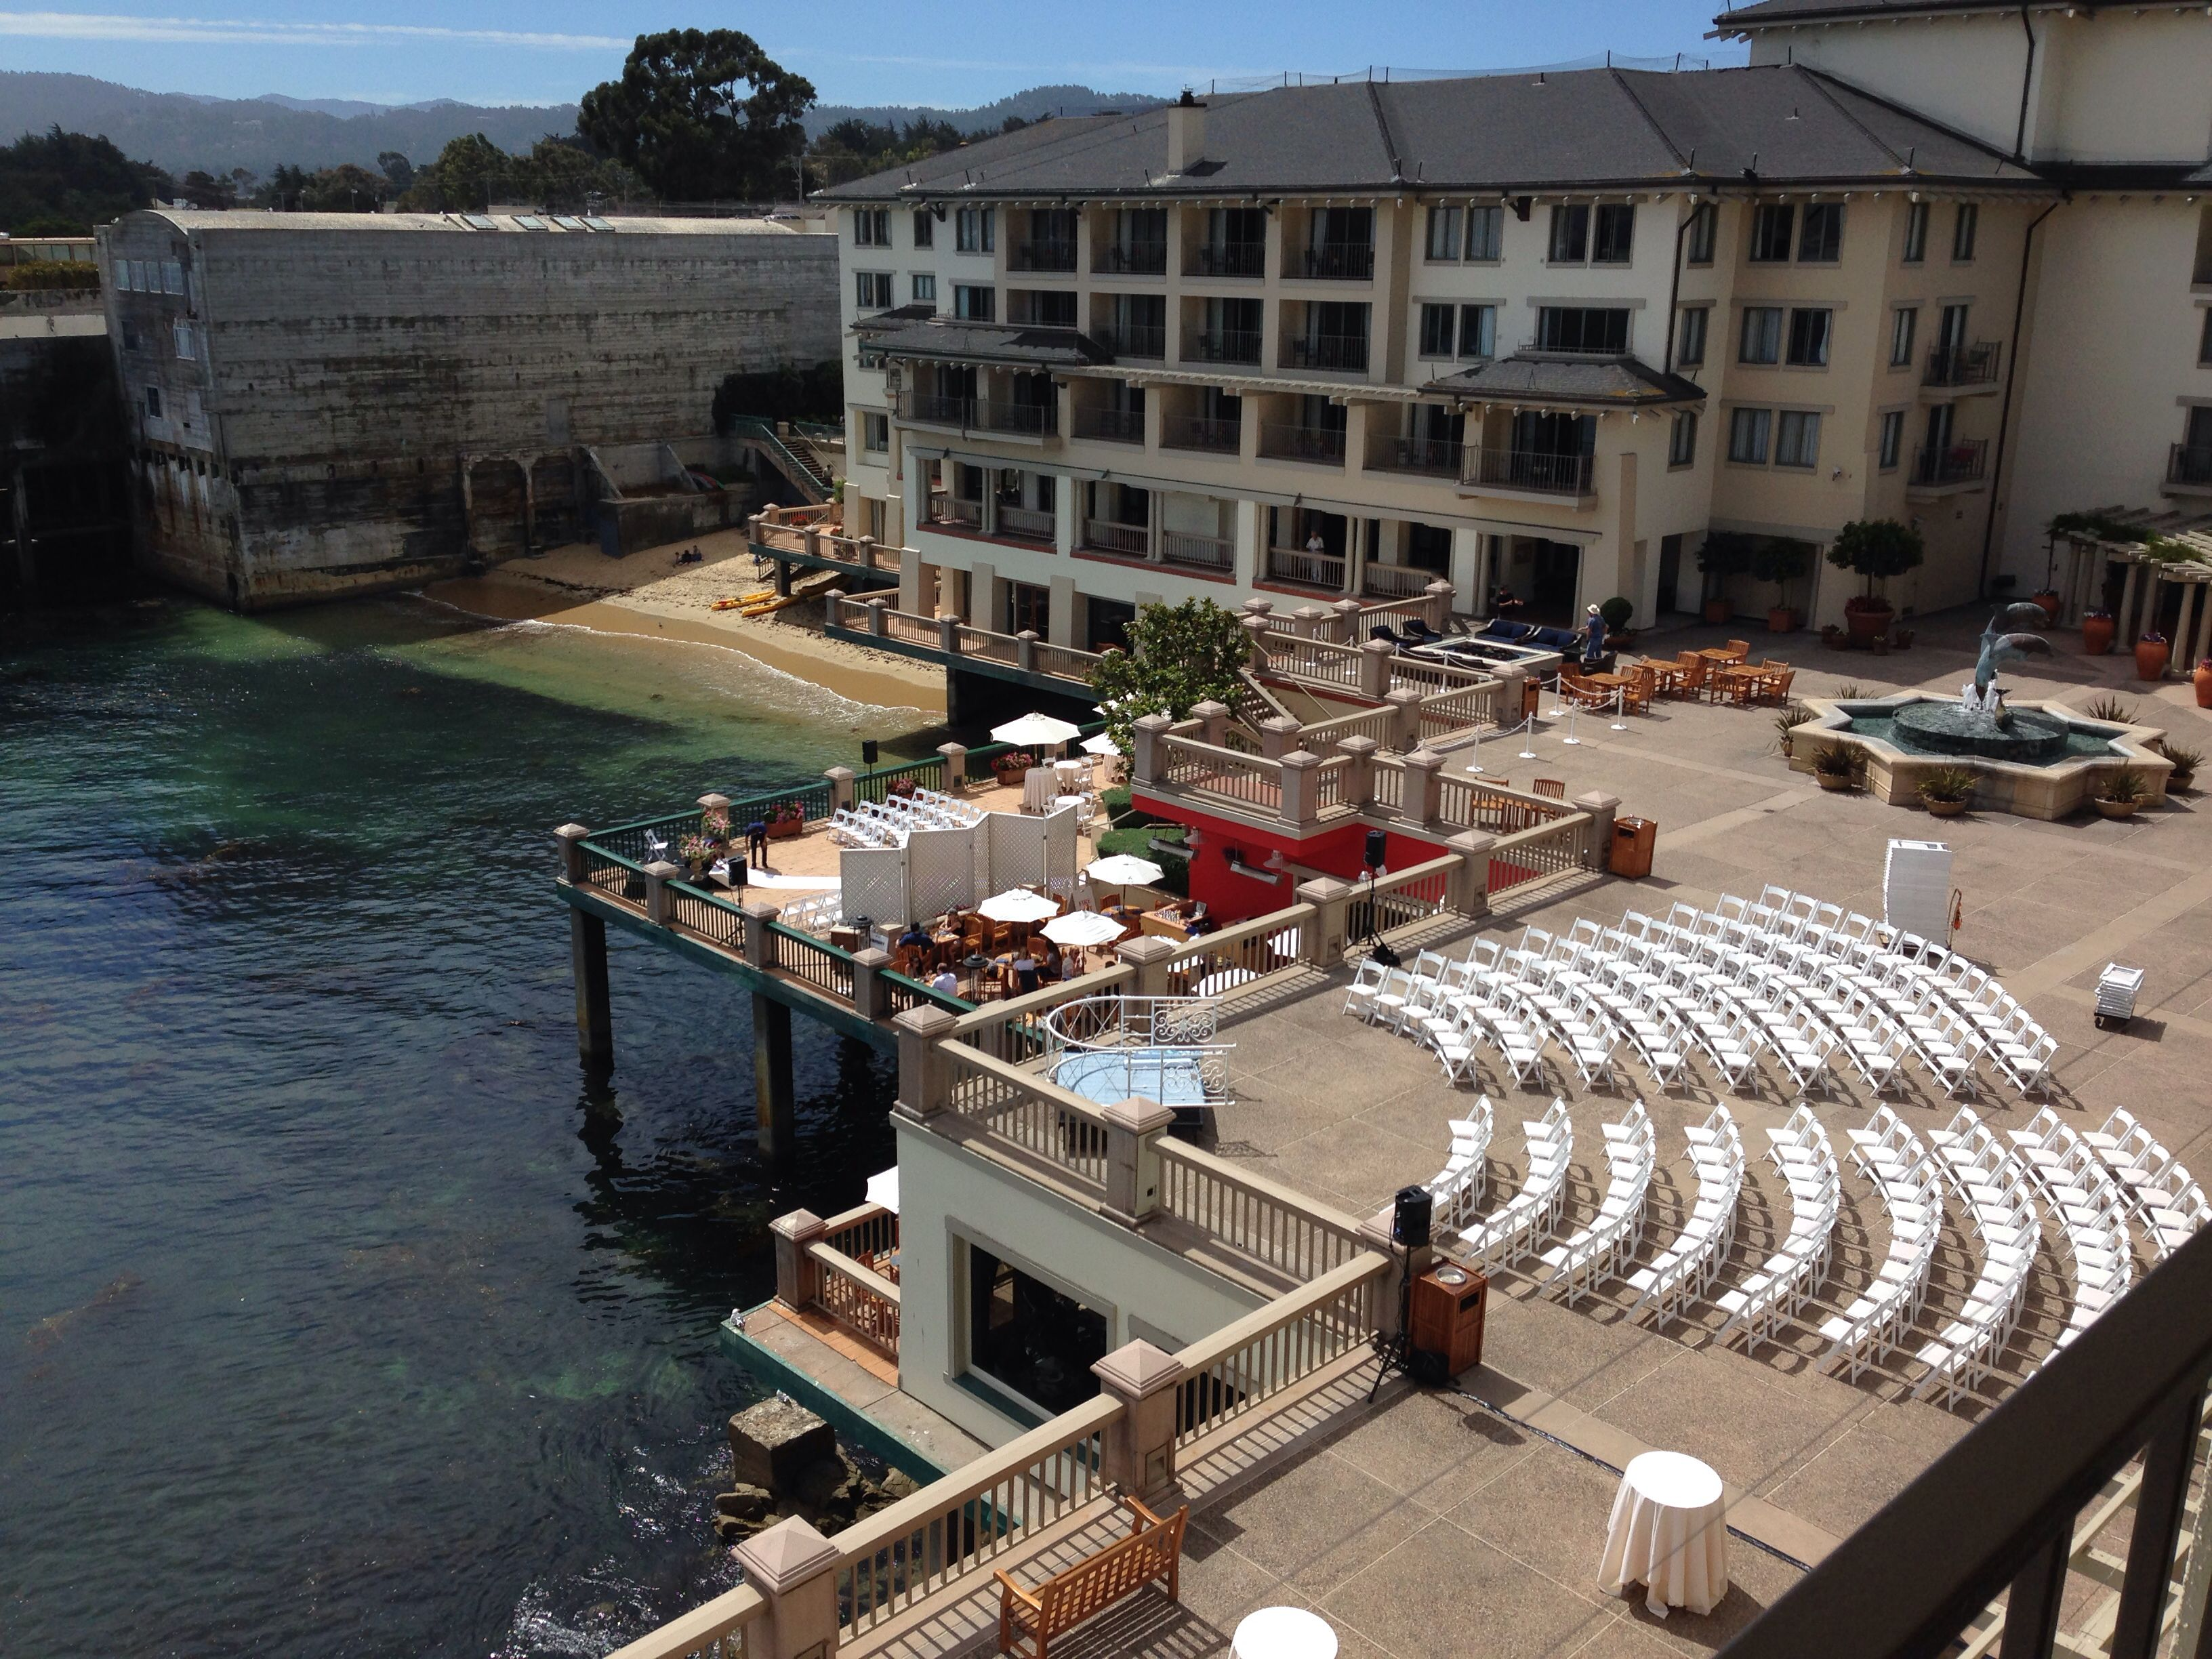 Monterey plaza hotel upper terrace august 30th, 2014